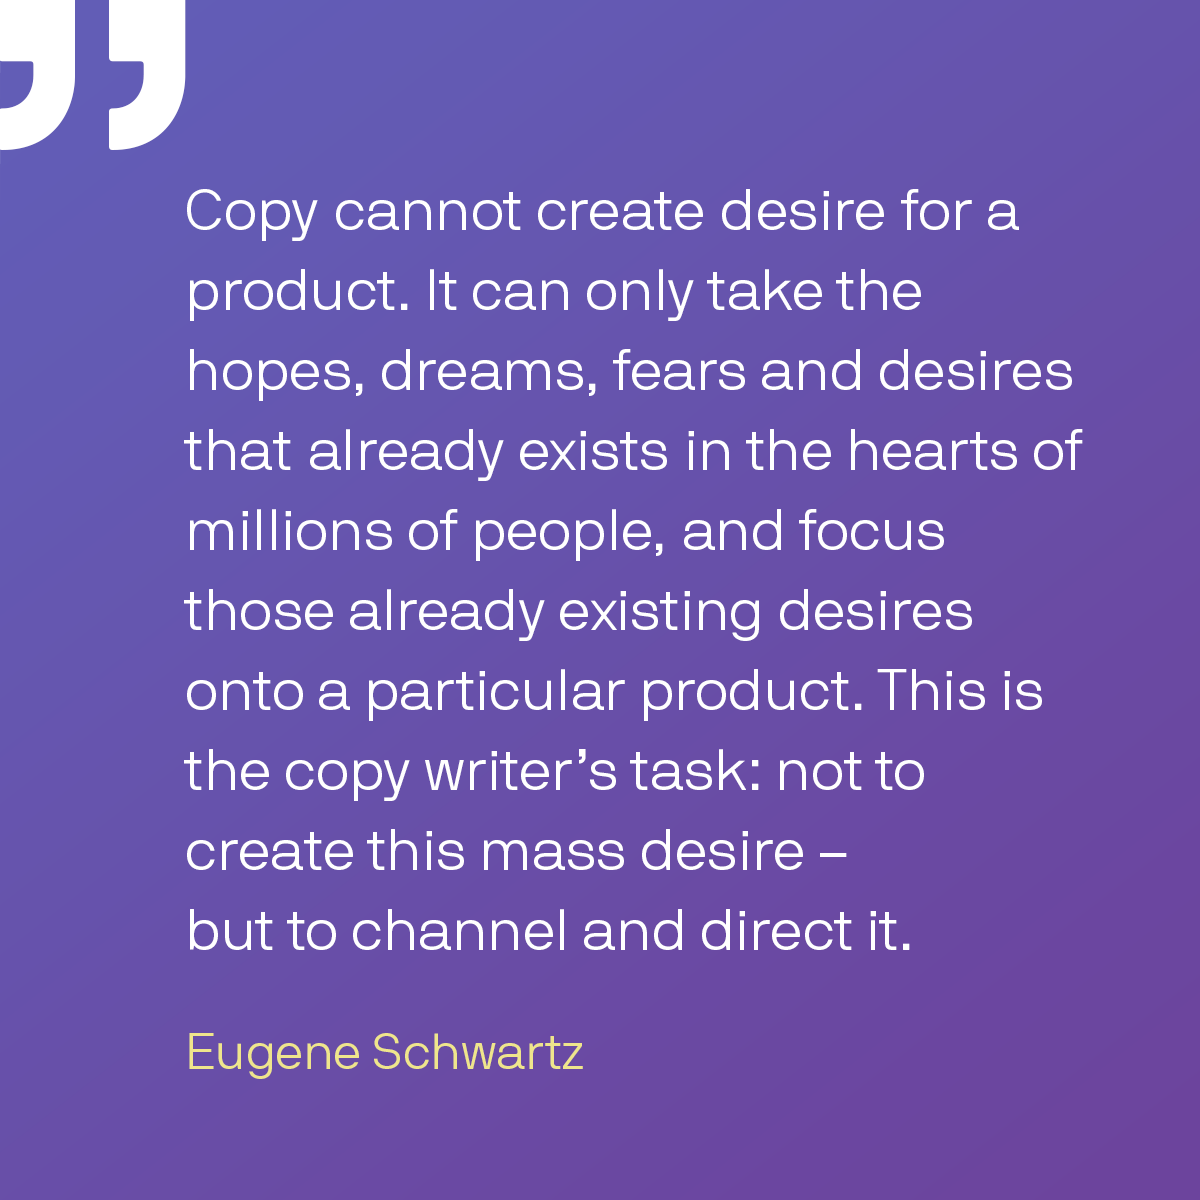 A quote from Eugene Schwartz